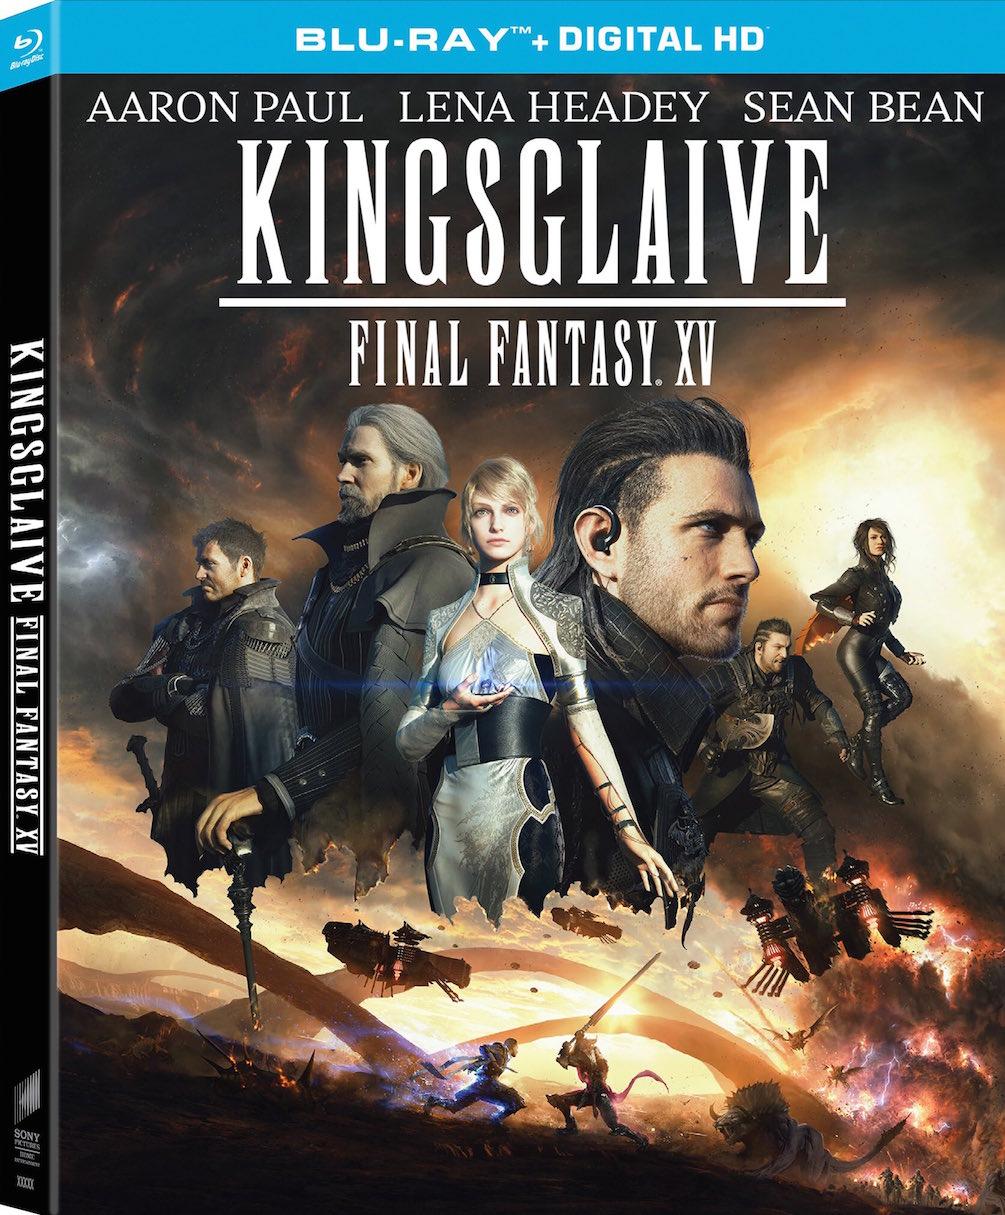 Kingsglaive Final Fantasy 15 movie sees trailer, release date revealed